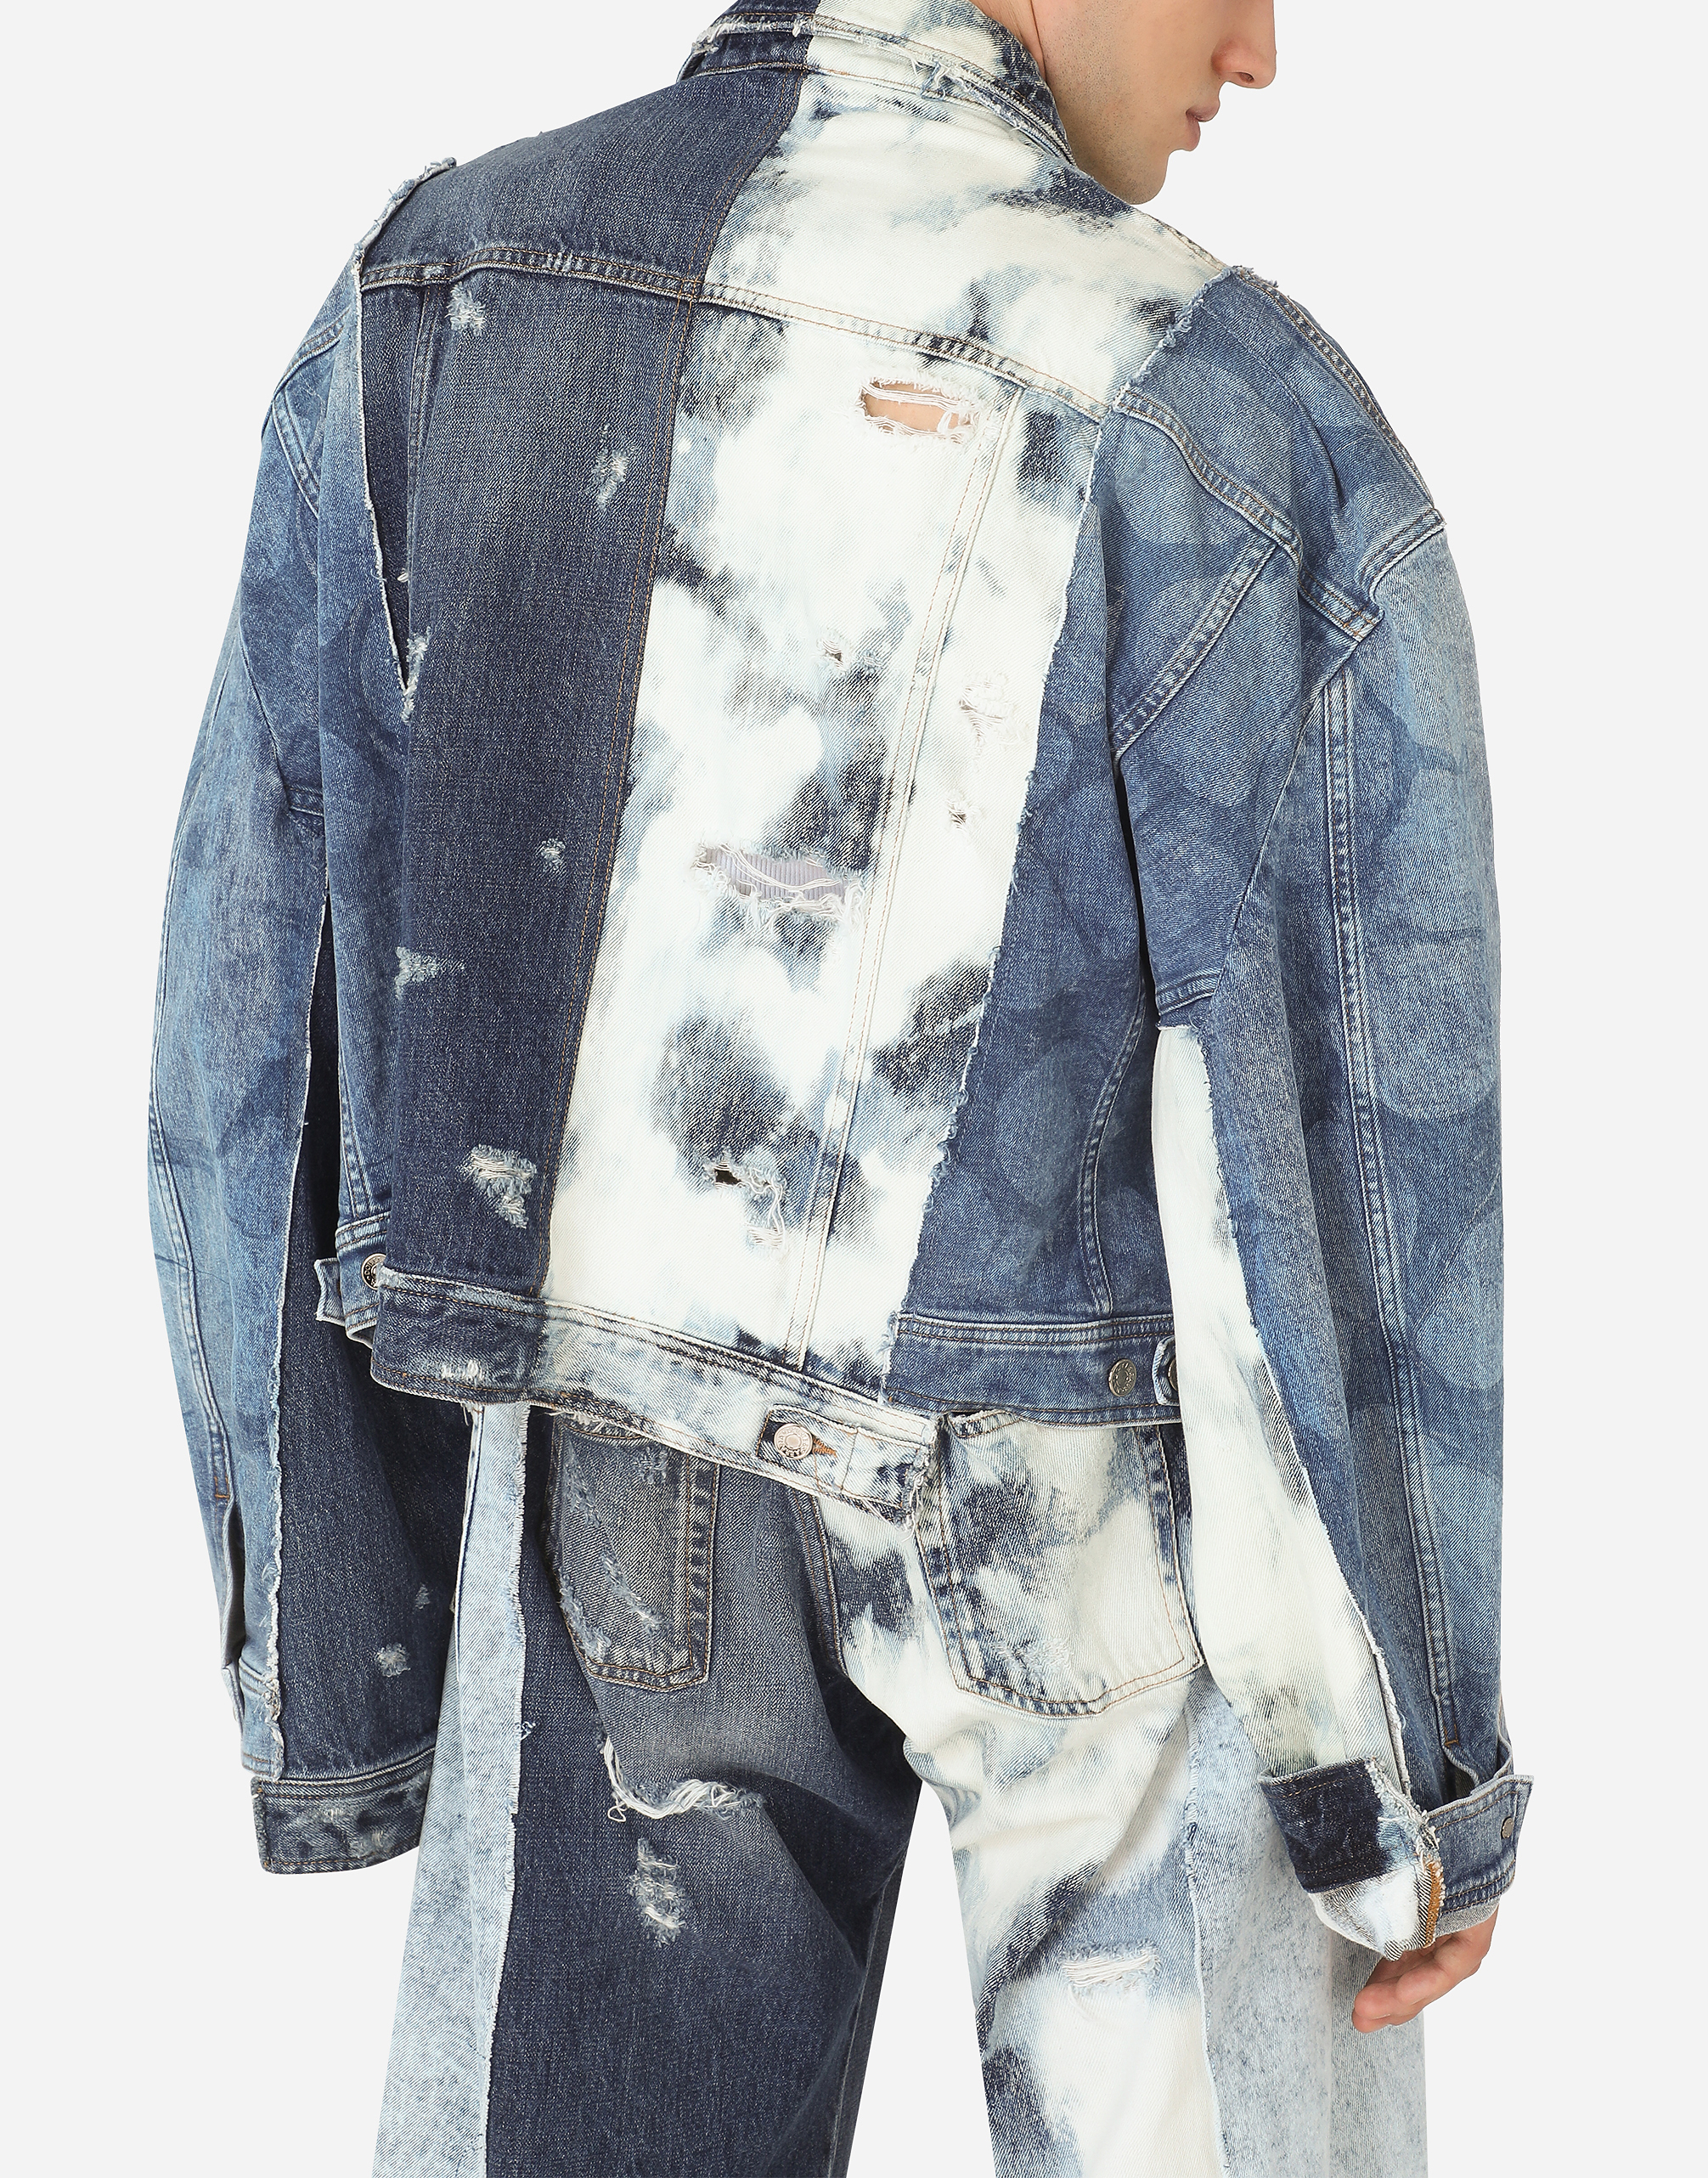 Mod Details about  /Dolce/&Gabbana Gold Jean Man Blue 5 Pockets Buttons Denim G6LBLZG8S78S9001